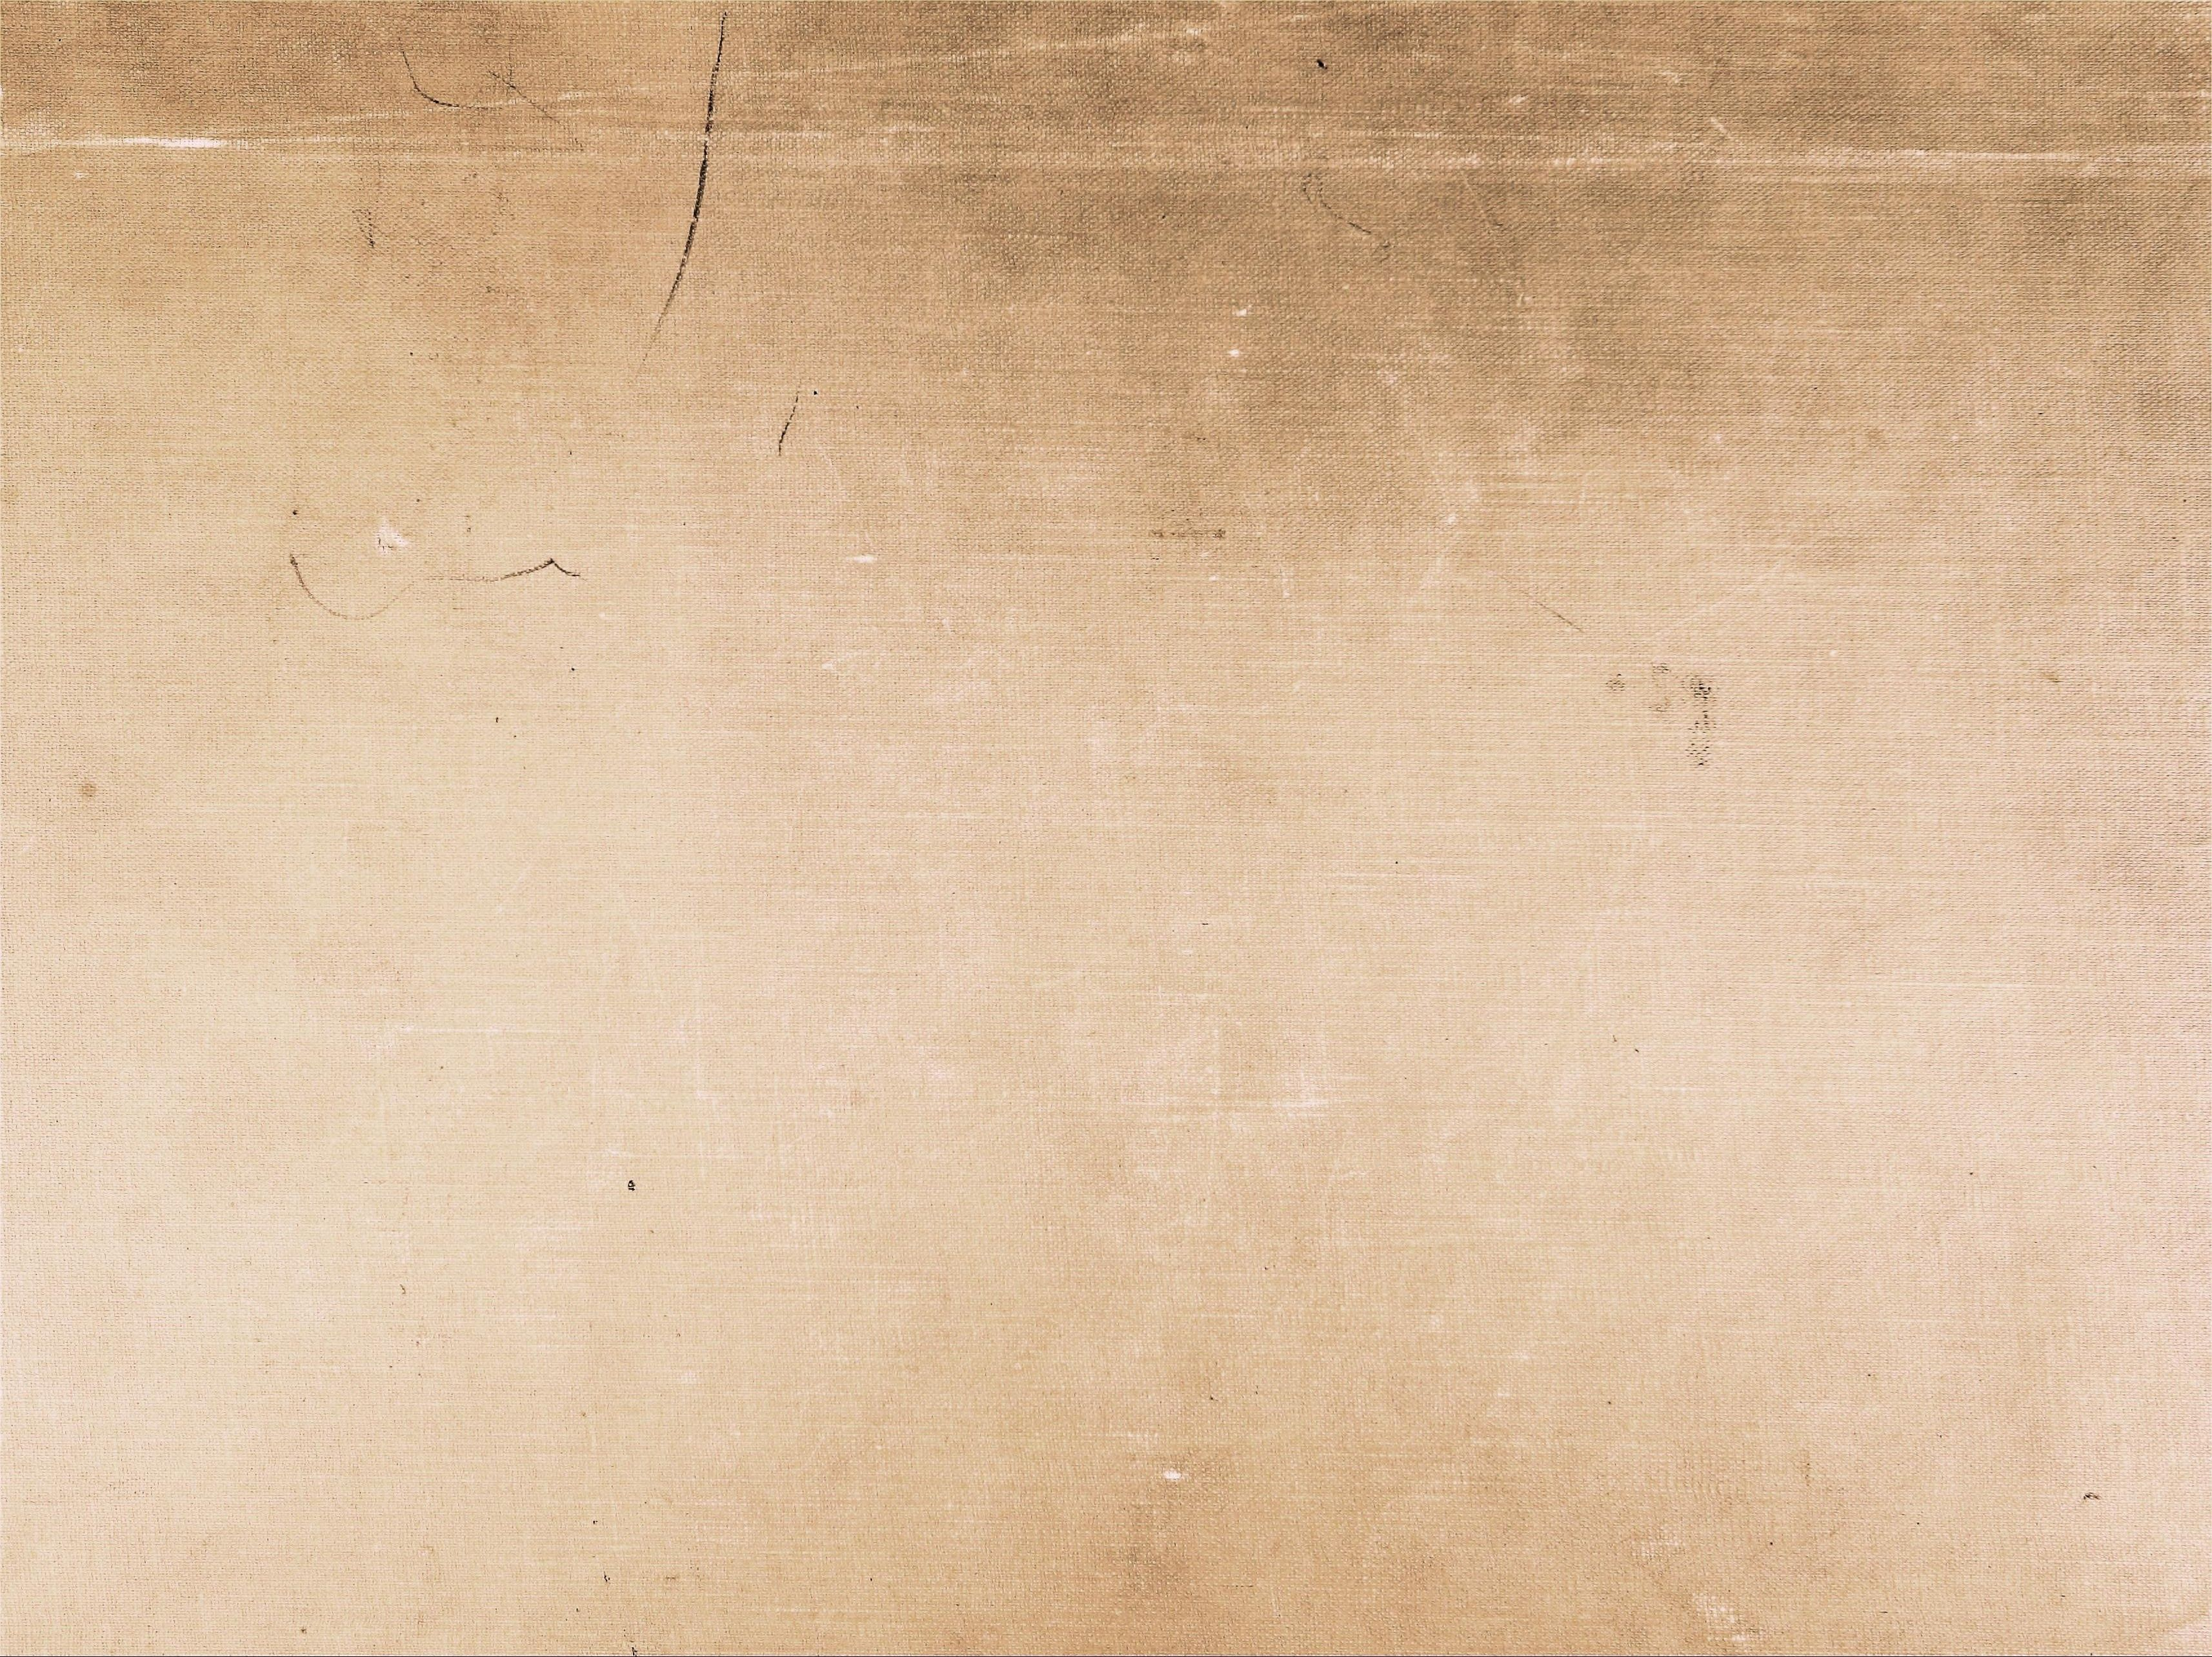 Design-Paper-Background-White-Texture | Client // Beach Shack ...